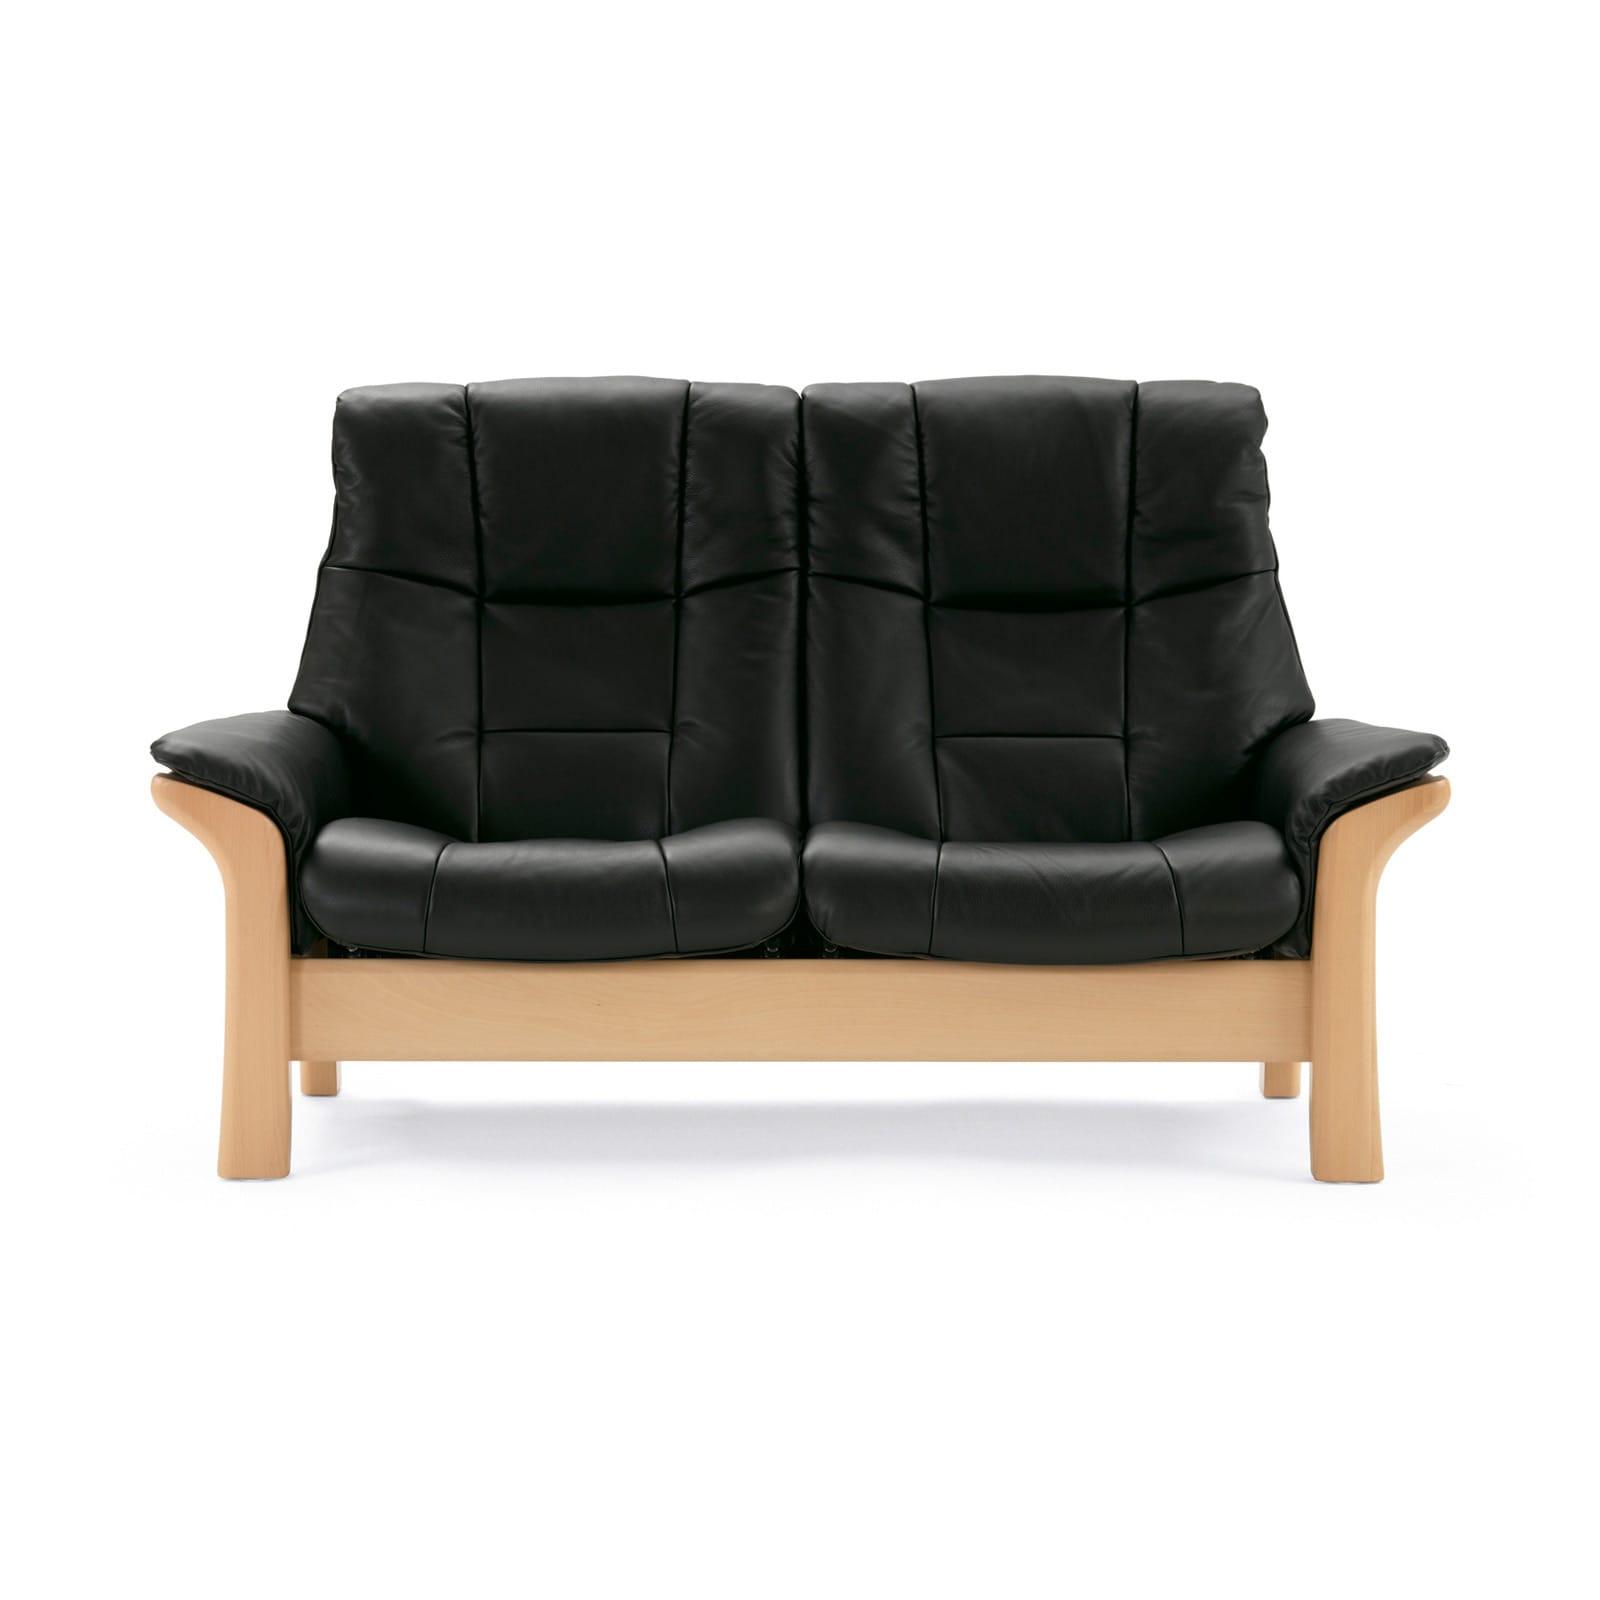 Full Size of 2 Sitzer Sofa Stressless Buckingham L Hoch Black Natur Ausziehbar U Form Bett 180x200 Mit Bettkasten Schwarz Kolonialstil 2er Relaxfunktion 3 220 X Schubladen Sofa 2 Sitzer Sofa